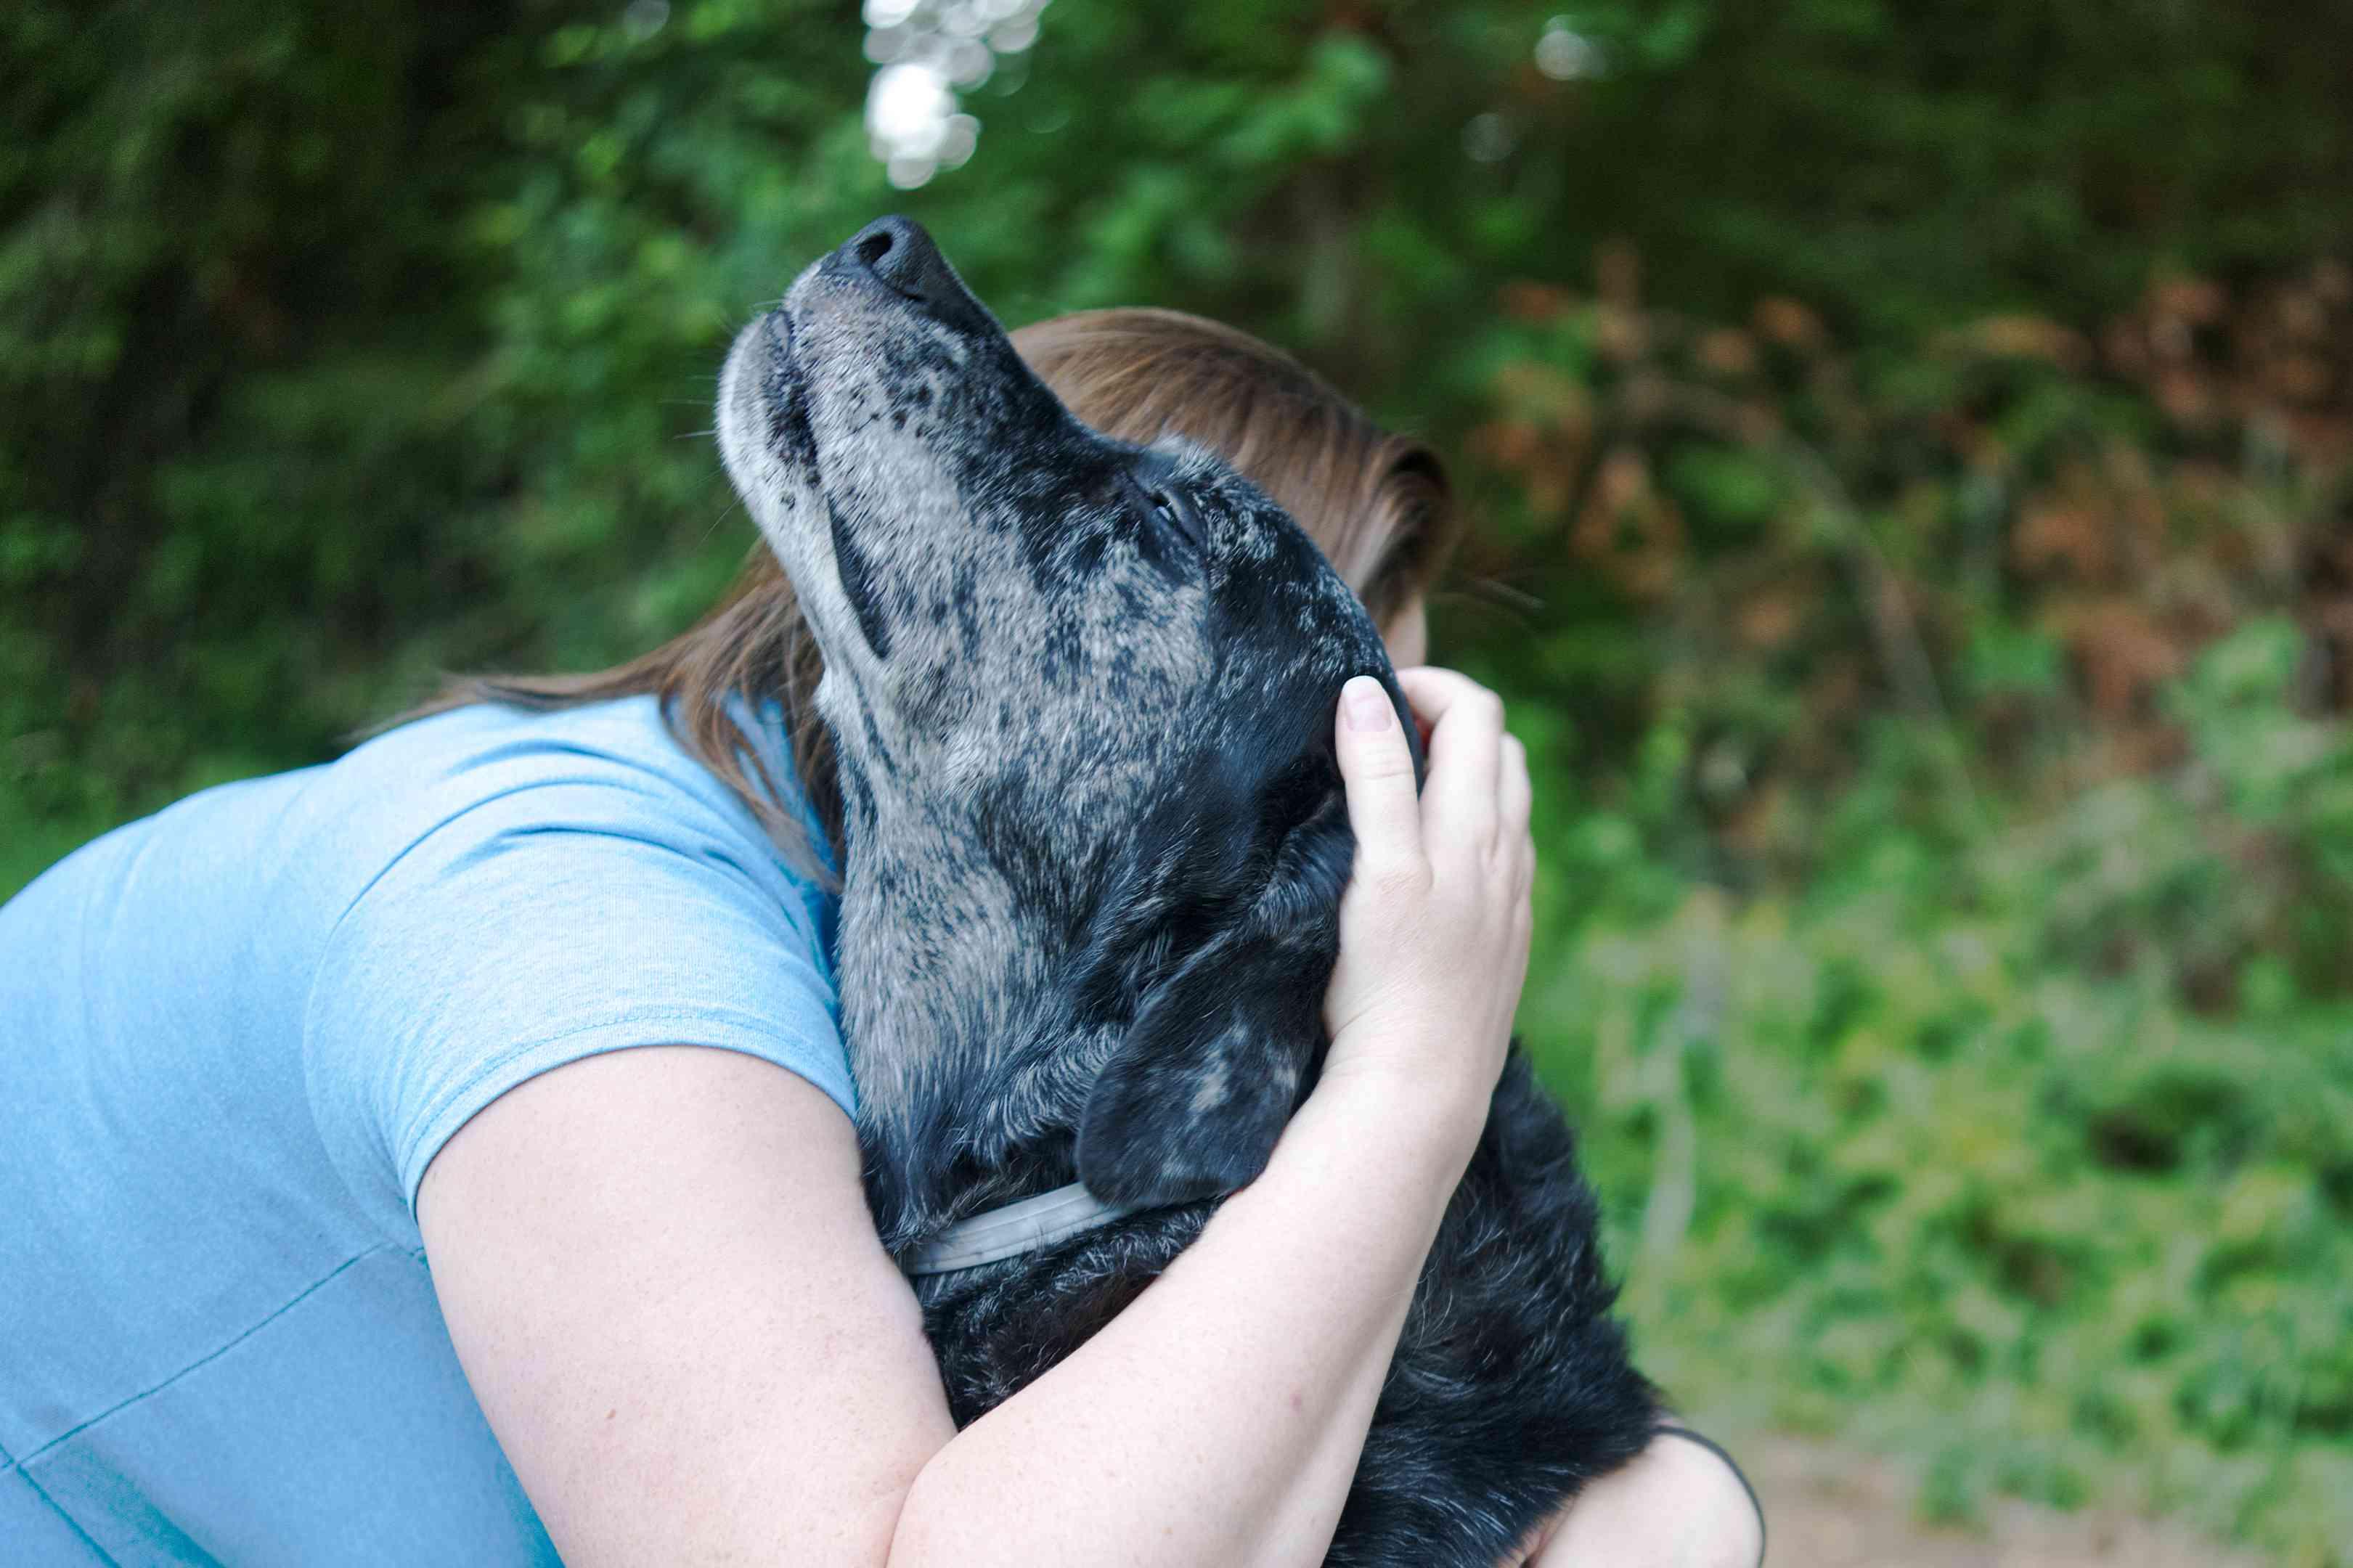 woman in blue shirt hugs older black dog outside while dog closes eyes